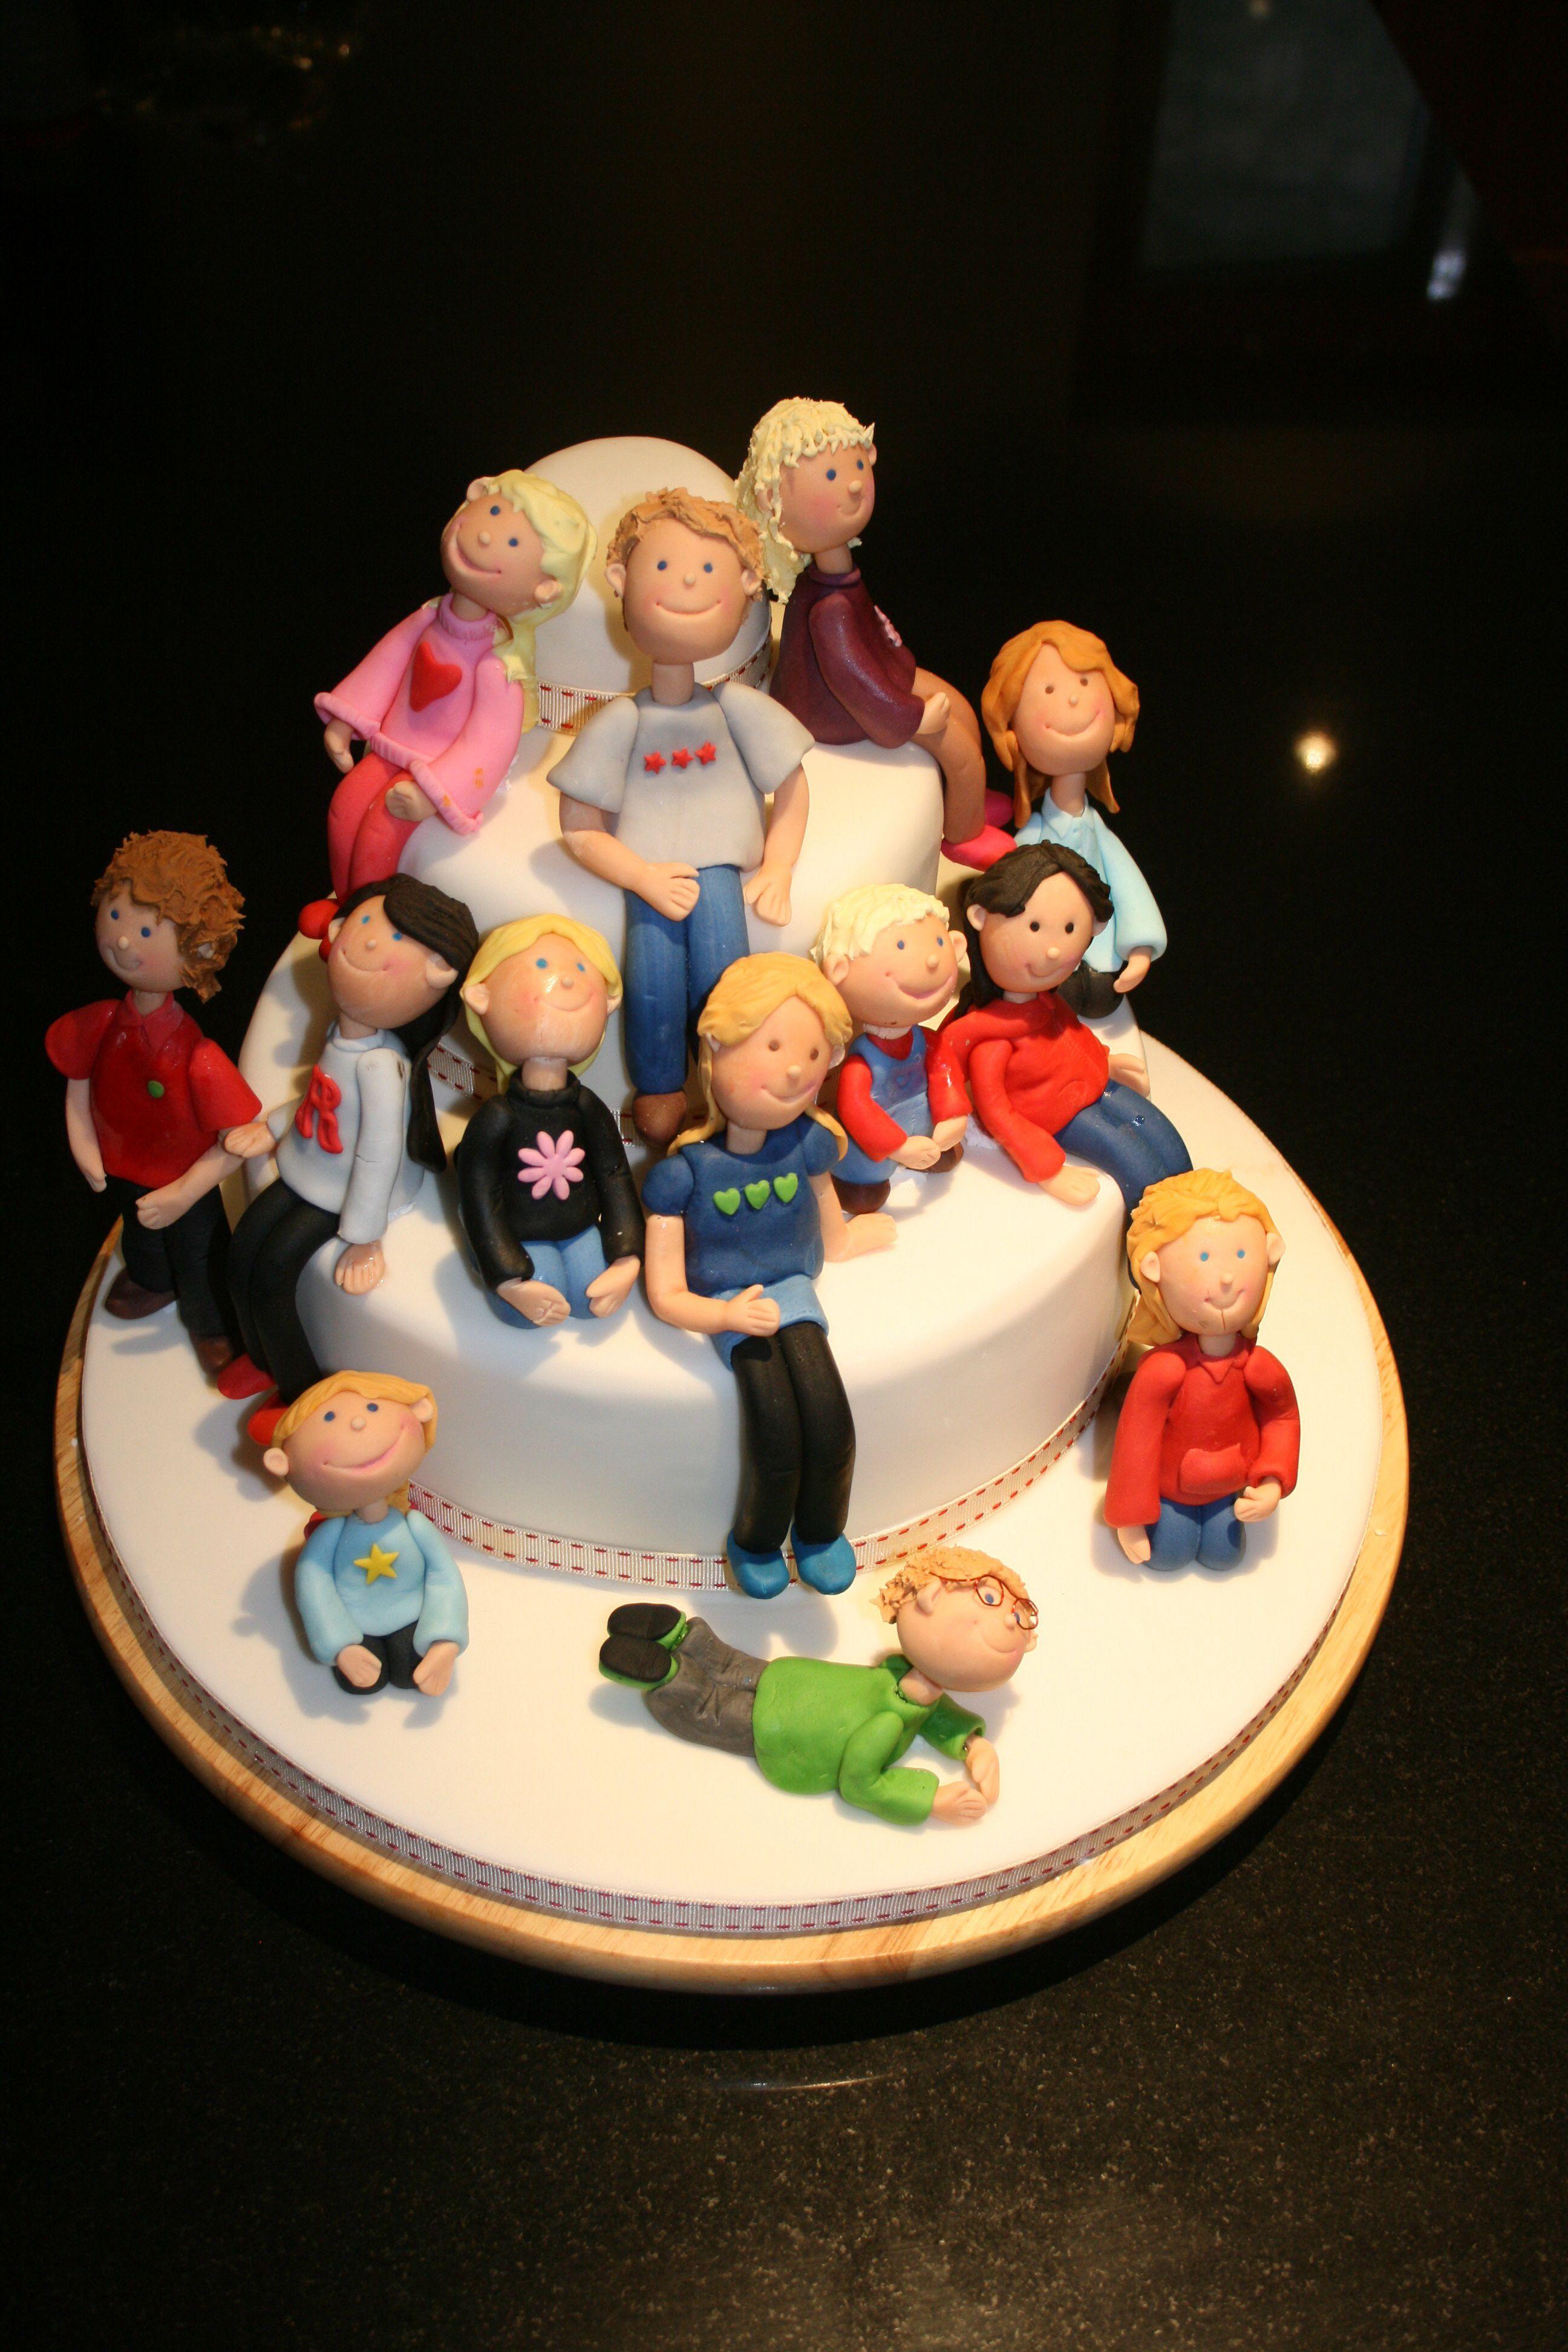 Grandma Cake All Her Grandchildren And Great Grandchildren Cakes